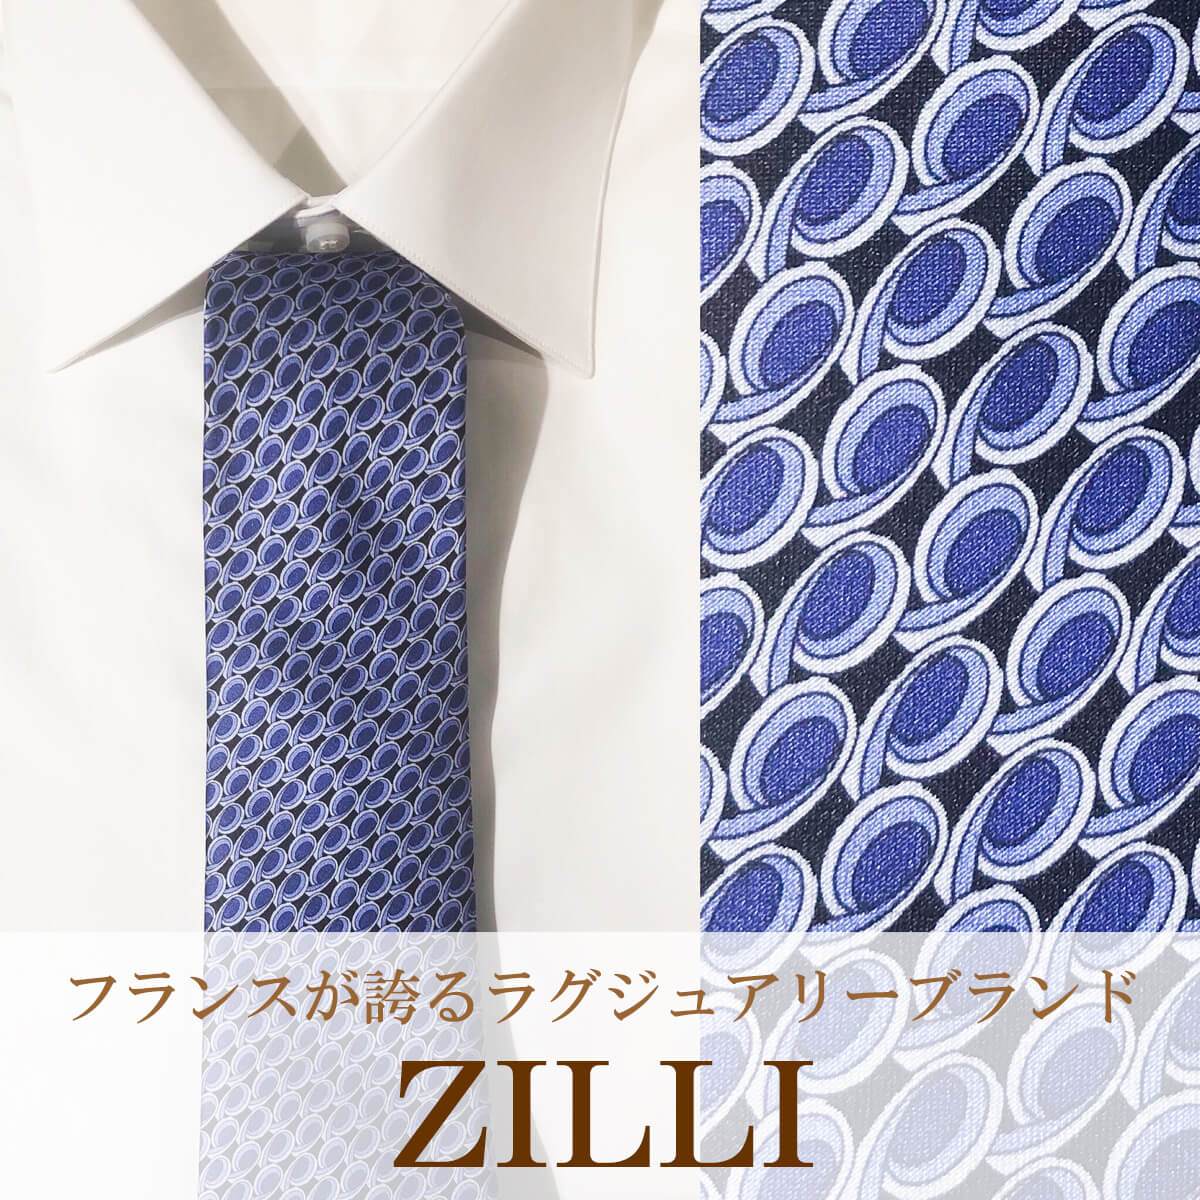 ZILLI (ジリー)ネクタイ ブランド 高級 ジリー ZILLI シルク プリント セブンフォールド 結婚式 パーティー シルク おしゃれ